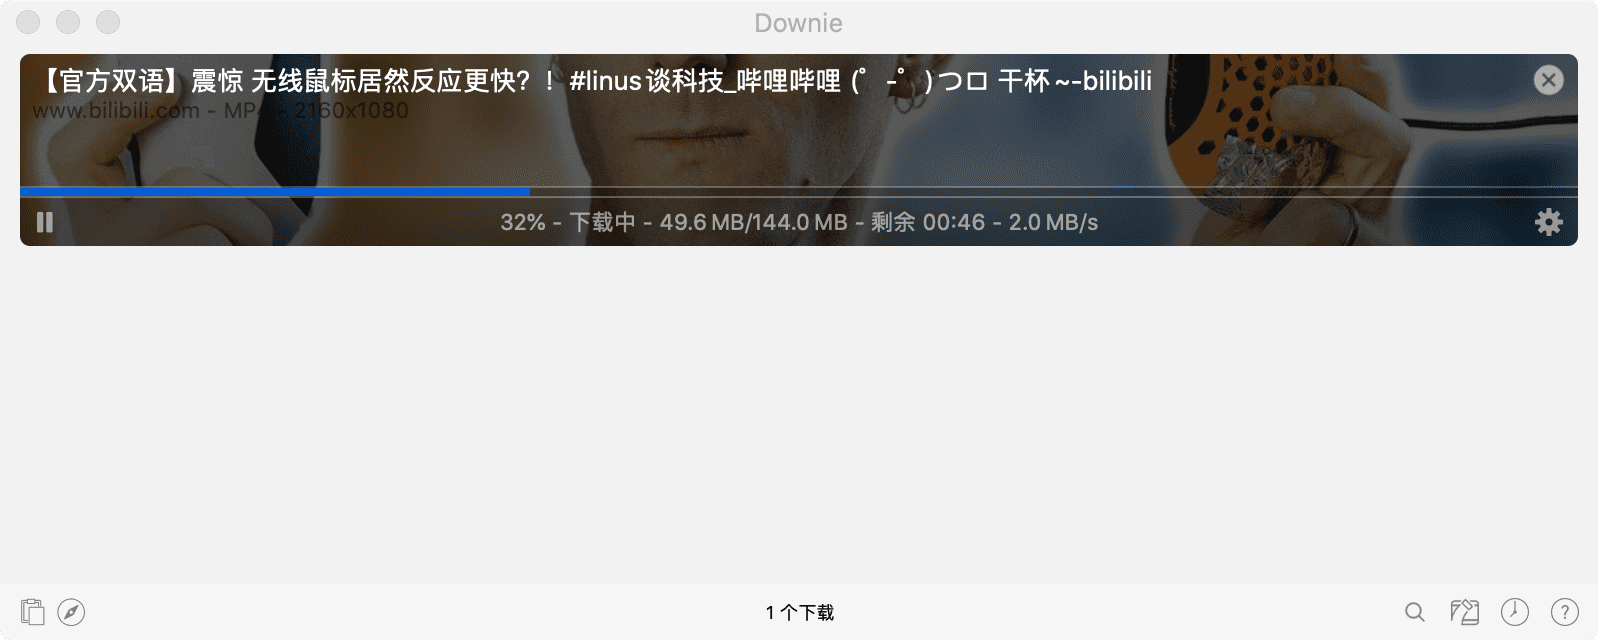 downie-download